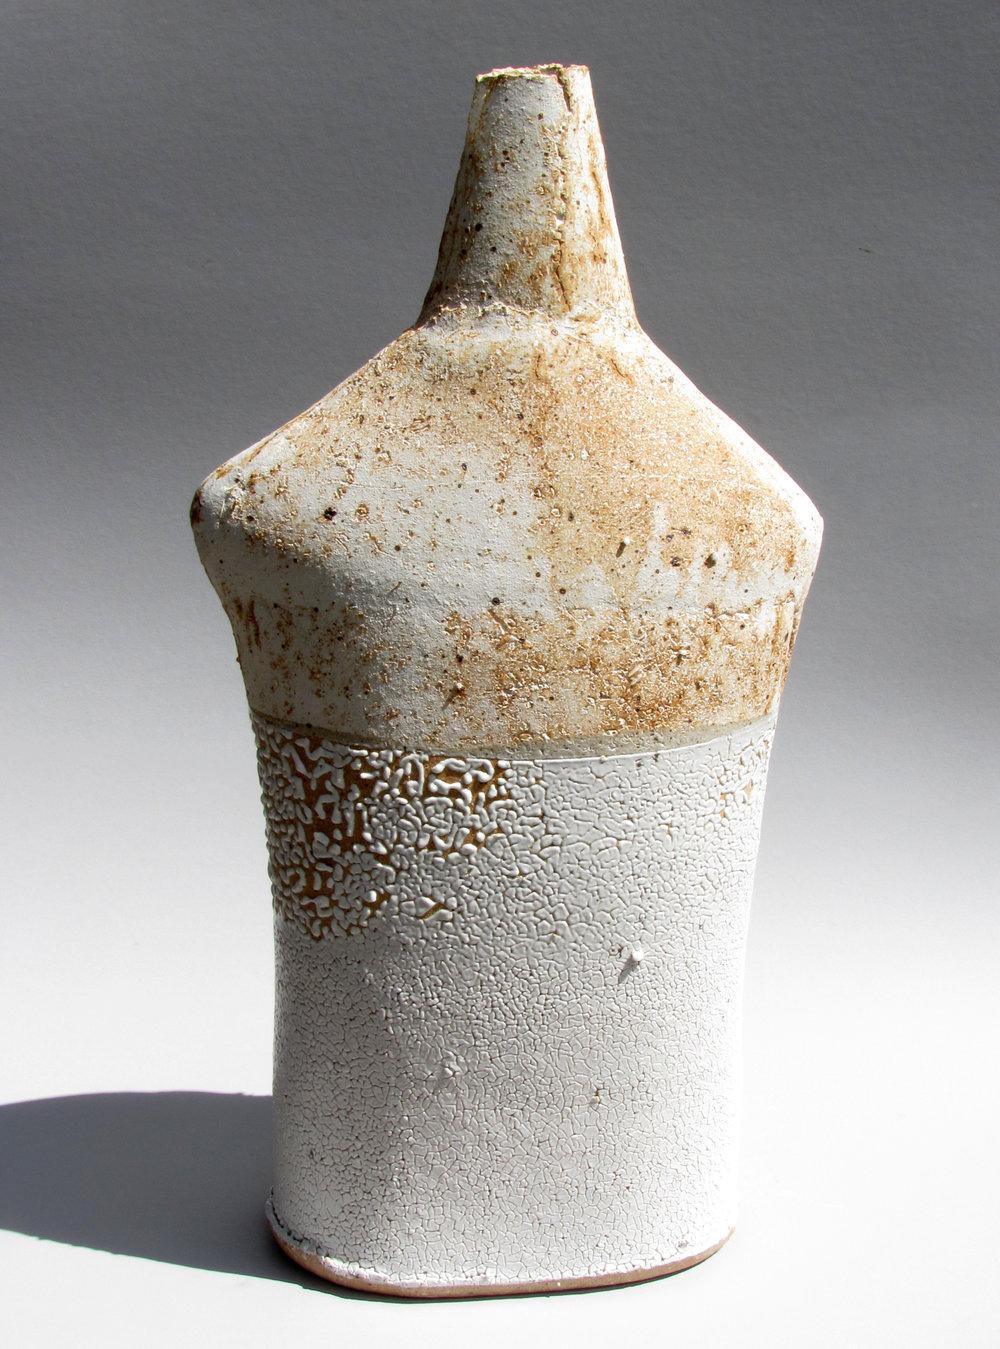 Shouldered Bottle - Chalk Beach49cm tall£650.00